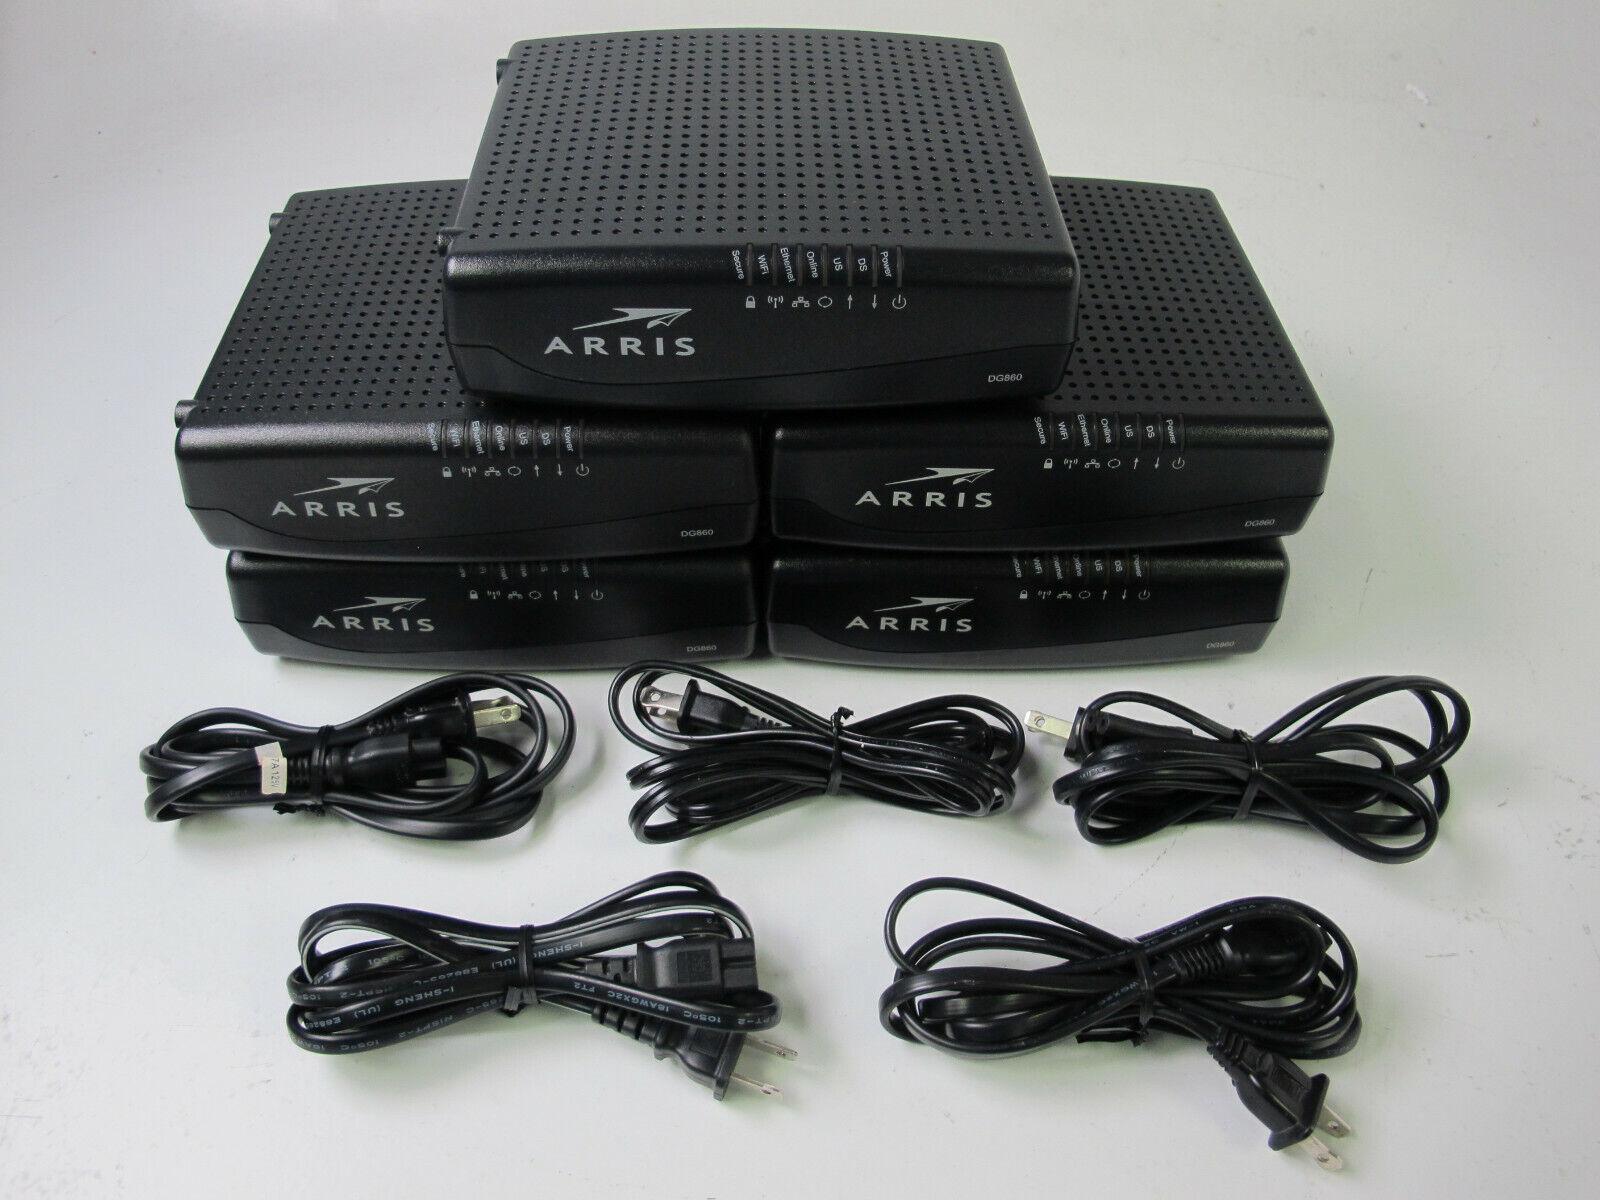 Arris DG860P2 Wireless DOCSIS 3.0 Data Gateway Modem DG860 1 Year Warranty